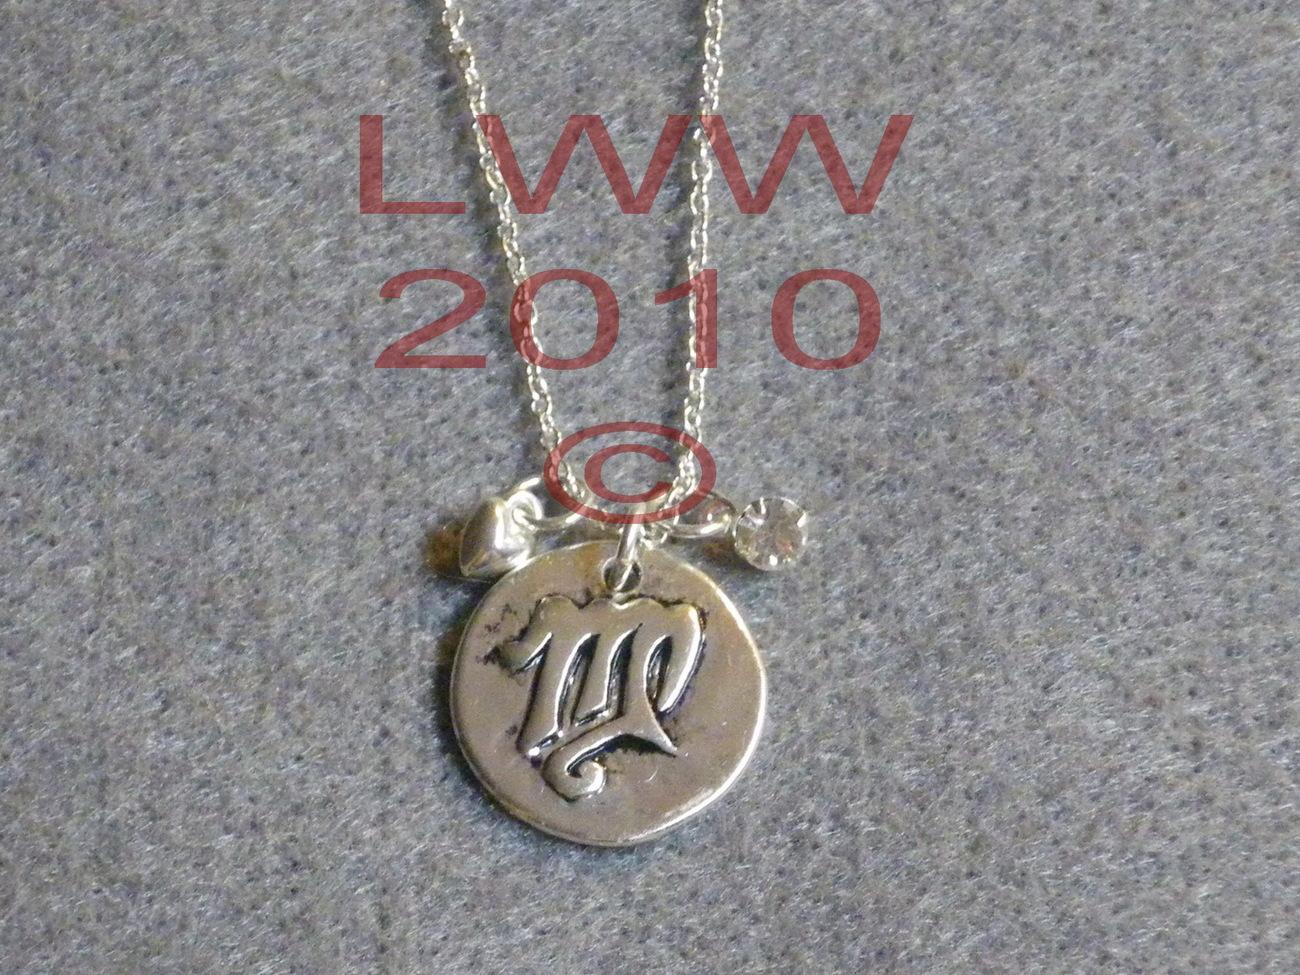 Virgo Zodiac Charm Necklace Pendant with Chain New Bonanza